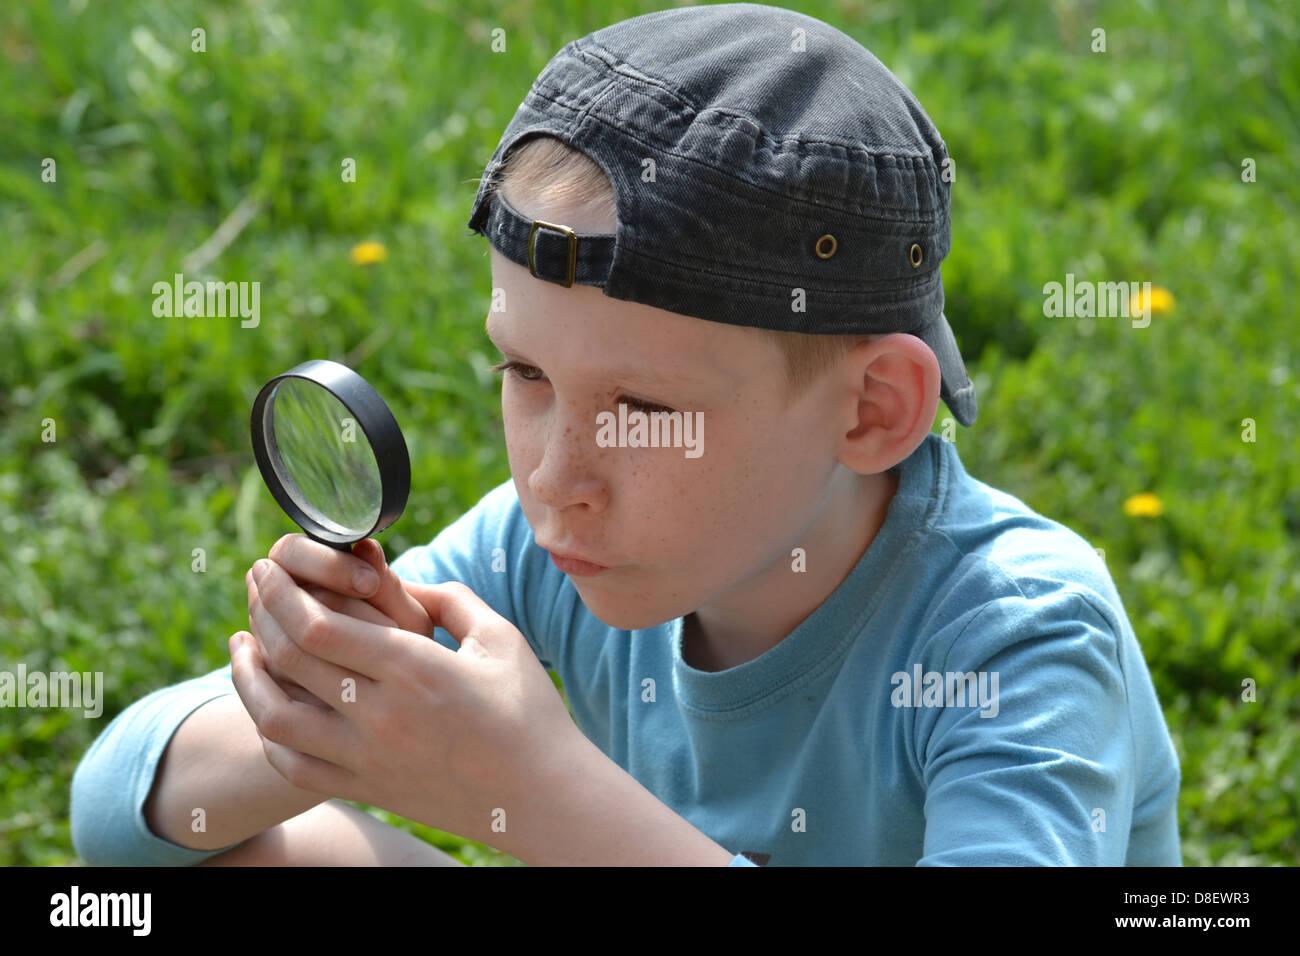 El adolescente observa a través de una lupa Foto de stock